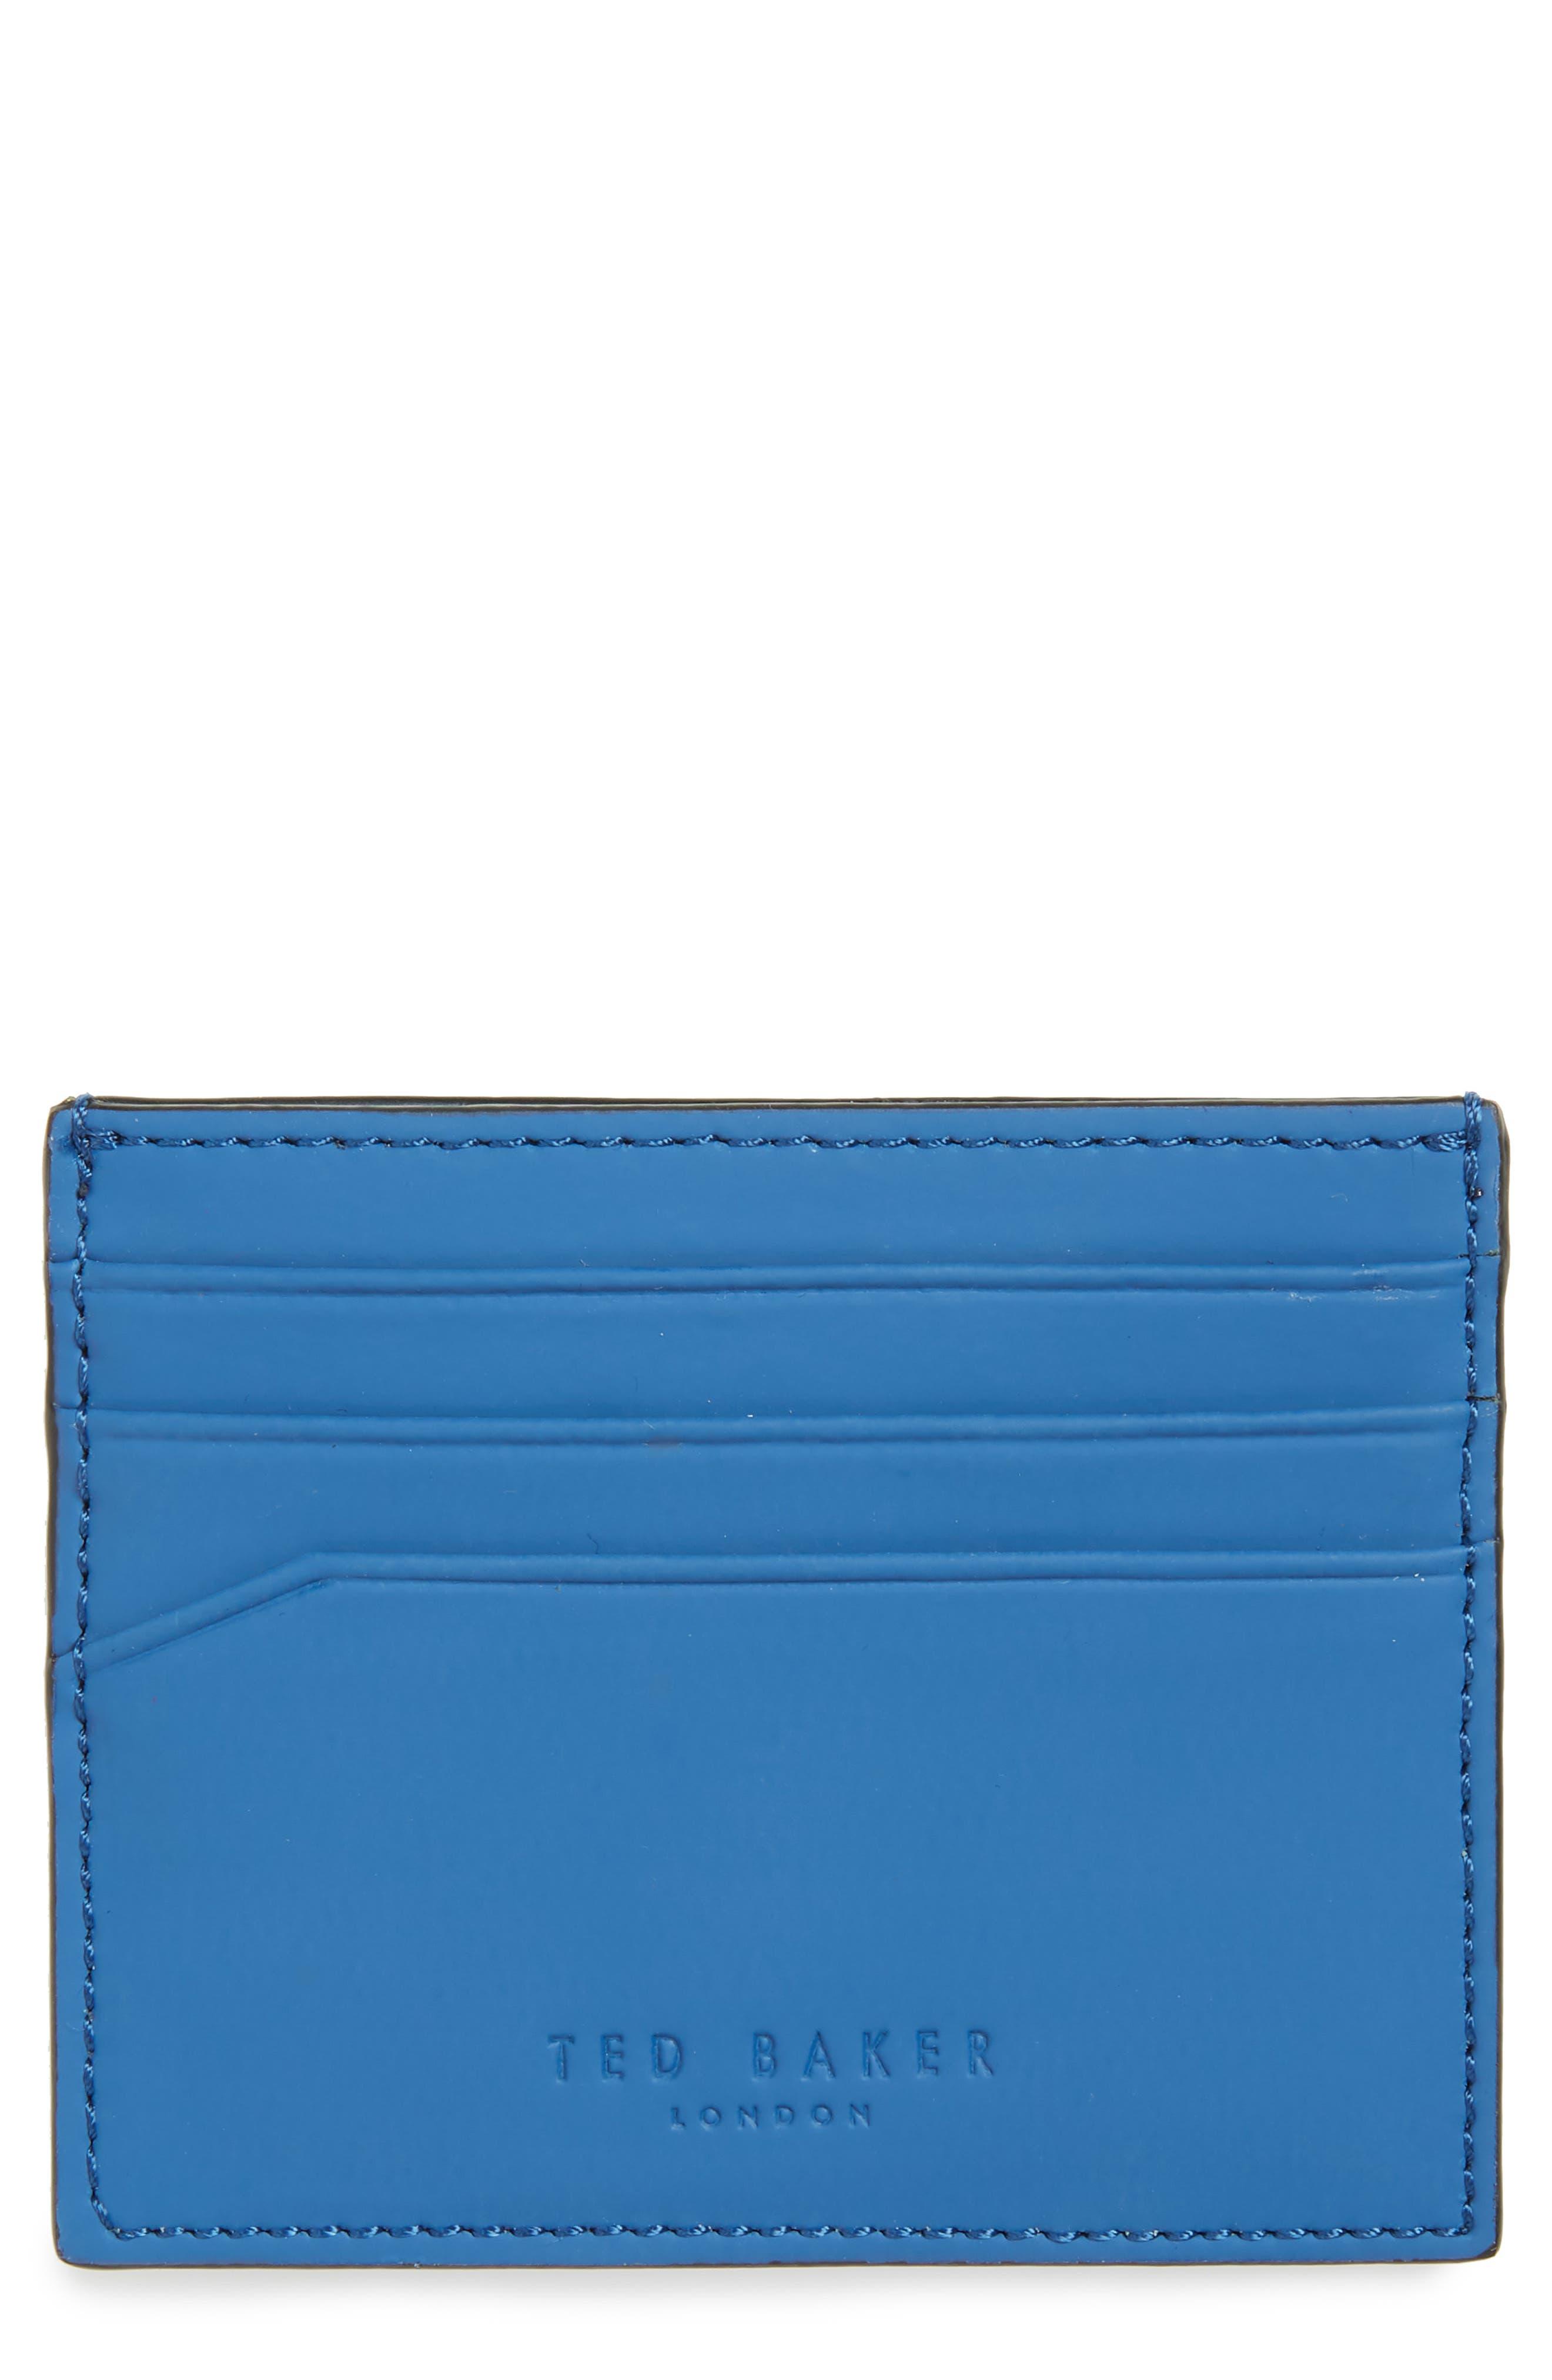 Sands Rubber Leather Card Case,                         Main,                         color, Blue